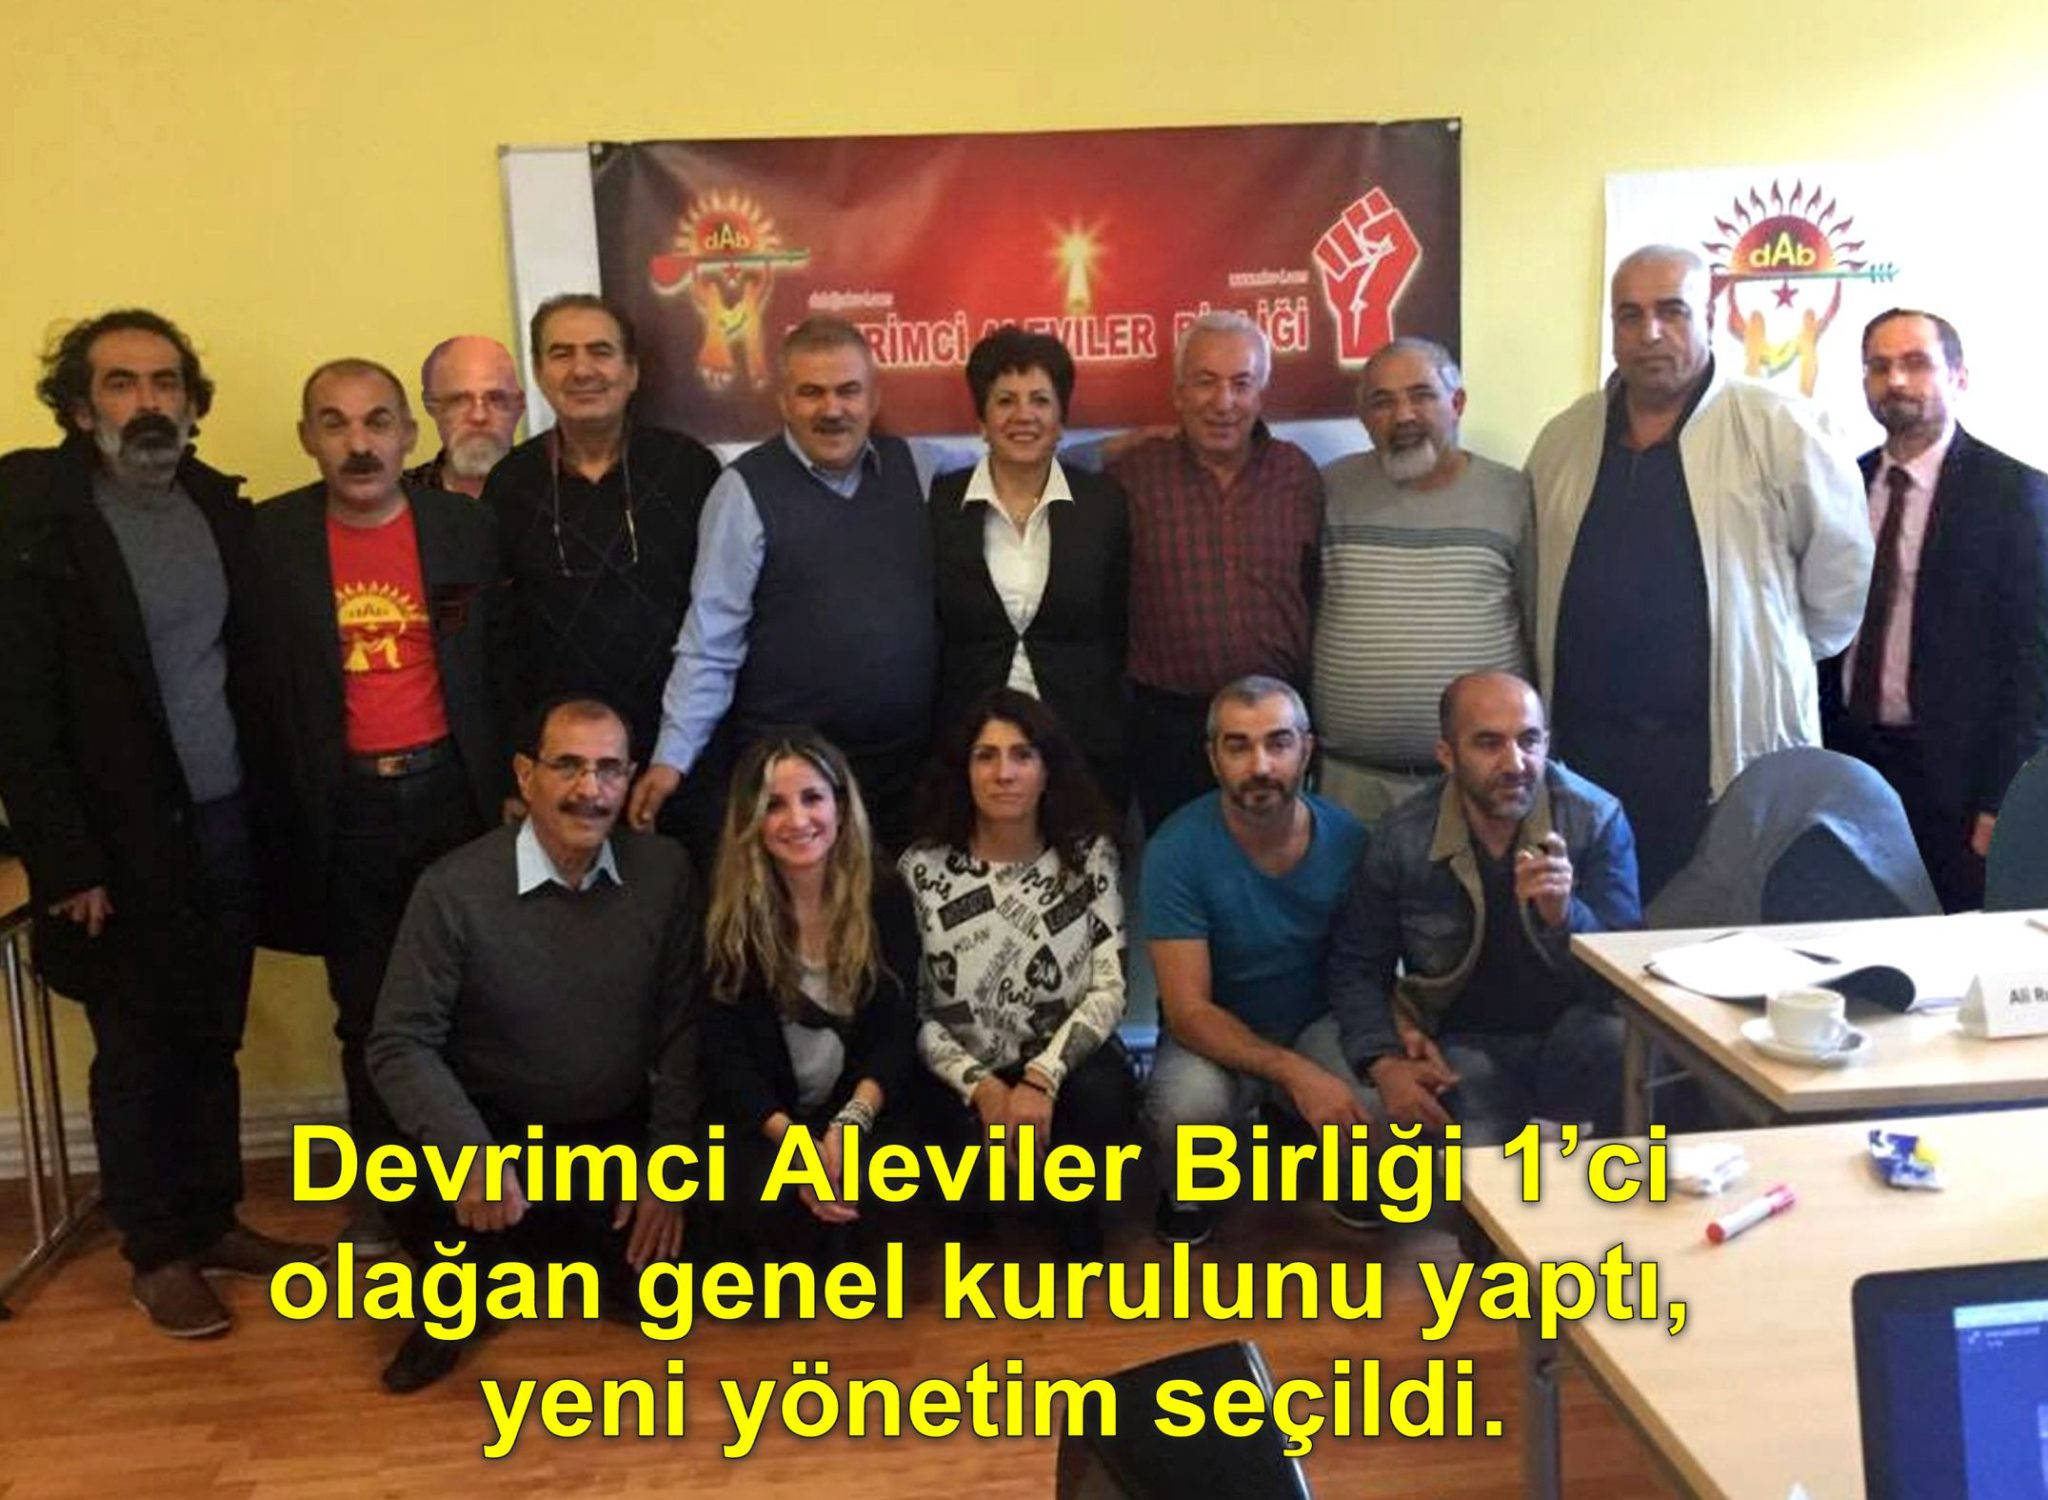 dab-1-genel-kurul-2016-alevi-pir-sultan-bektasi-kizilbas-devrimci-aleviler-birligi-cemevi